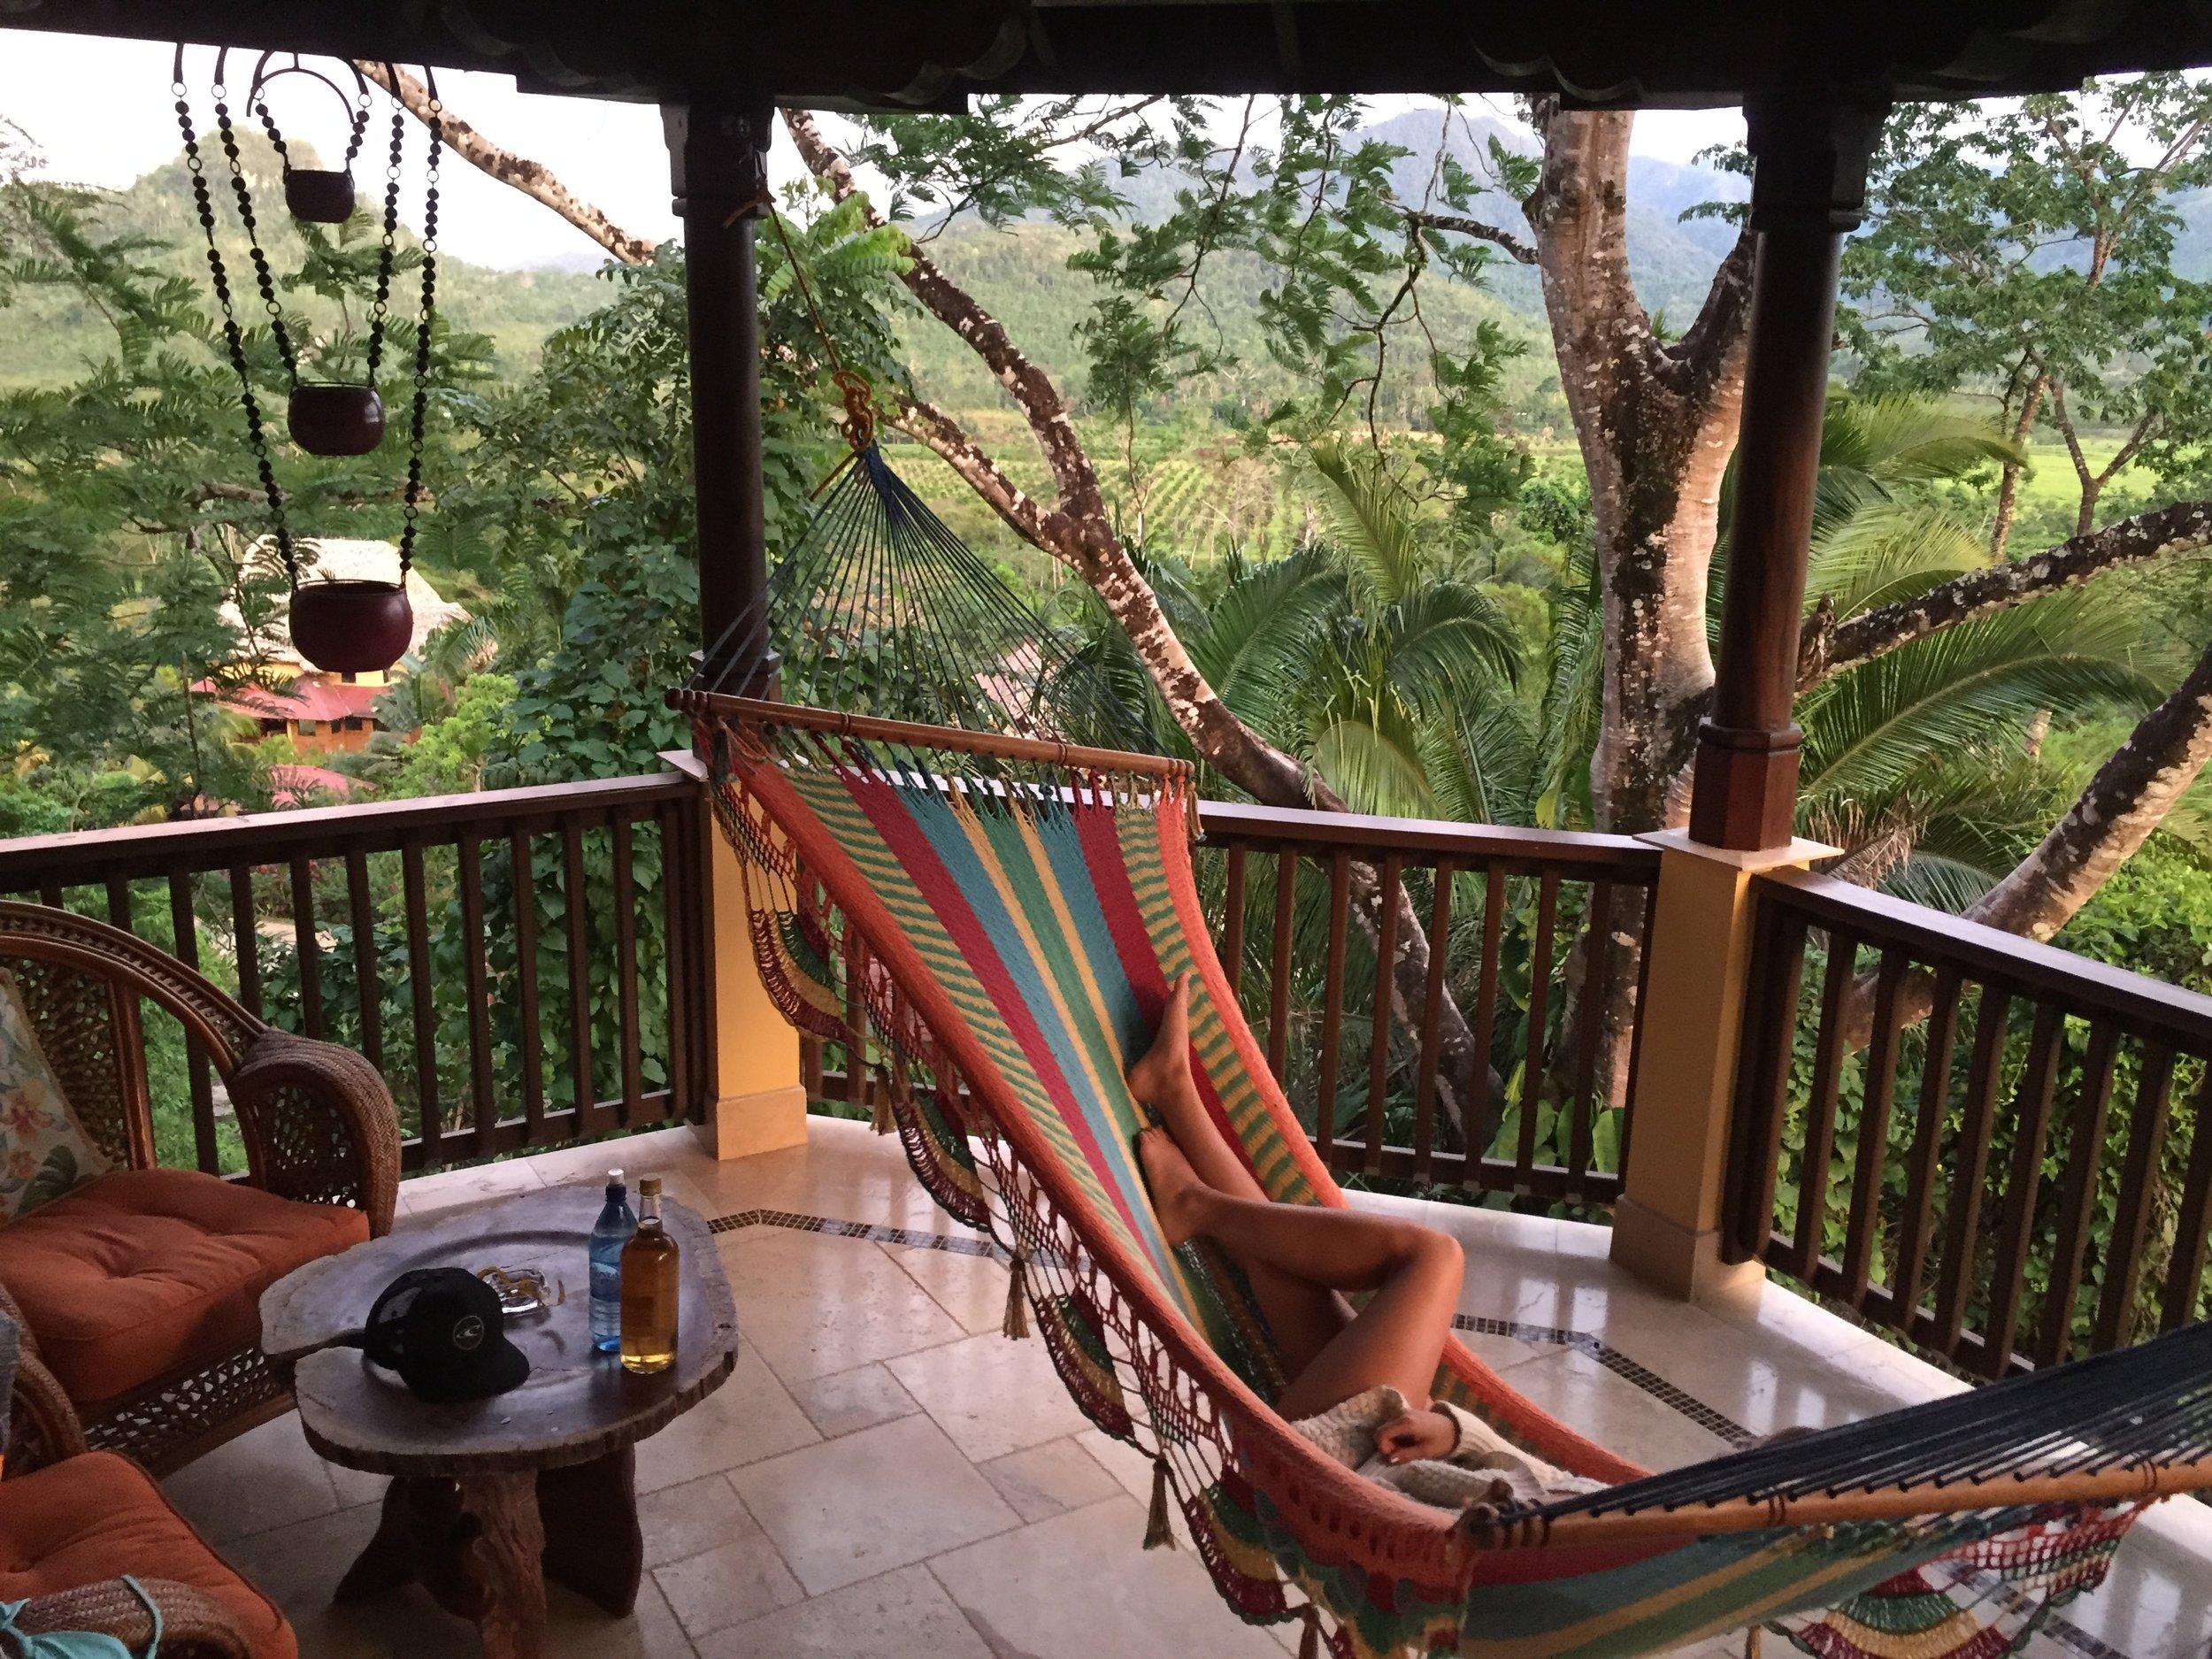 Multi-colored hammock on balcony overlooking jungle.JPG